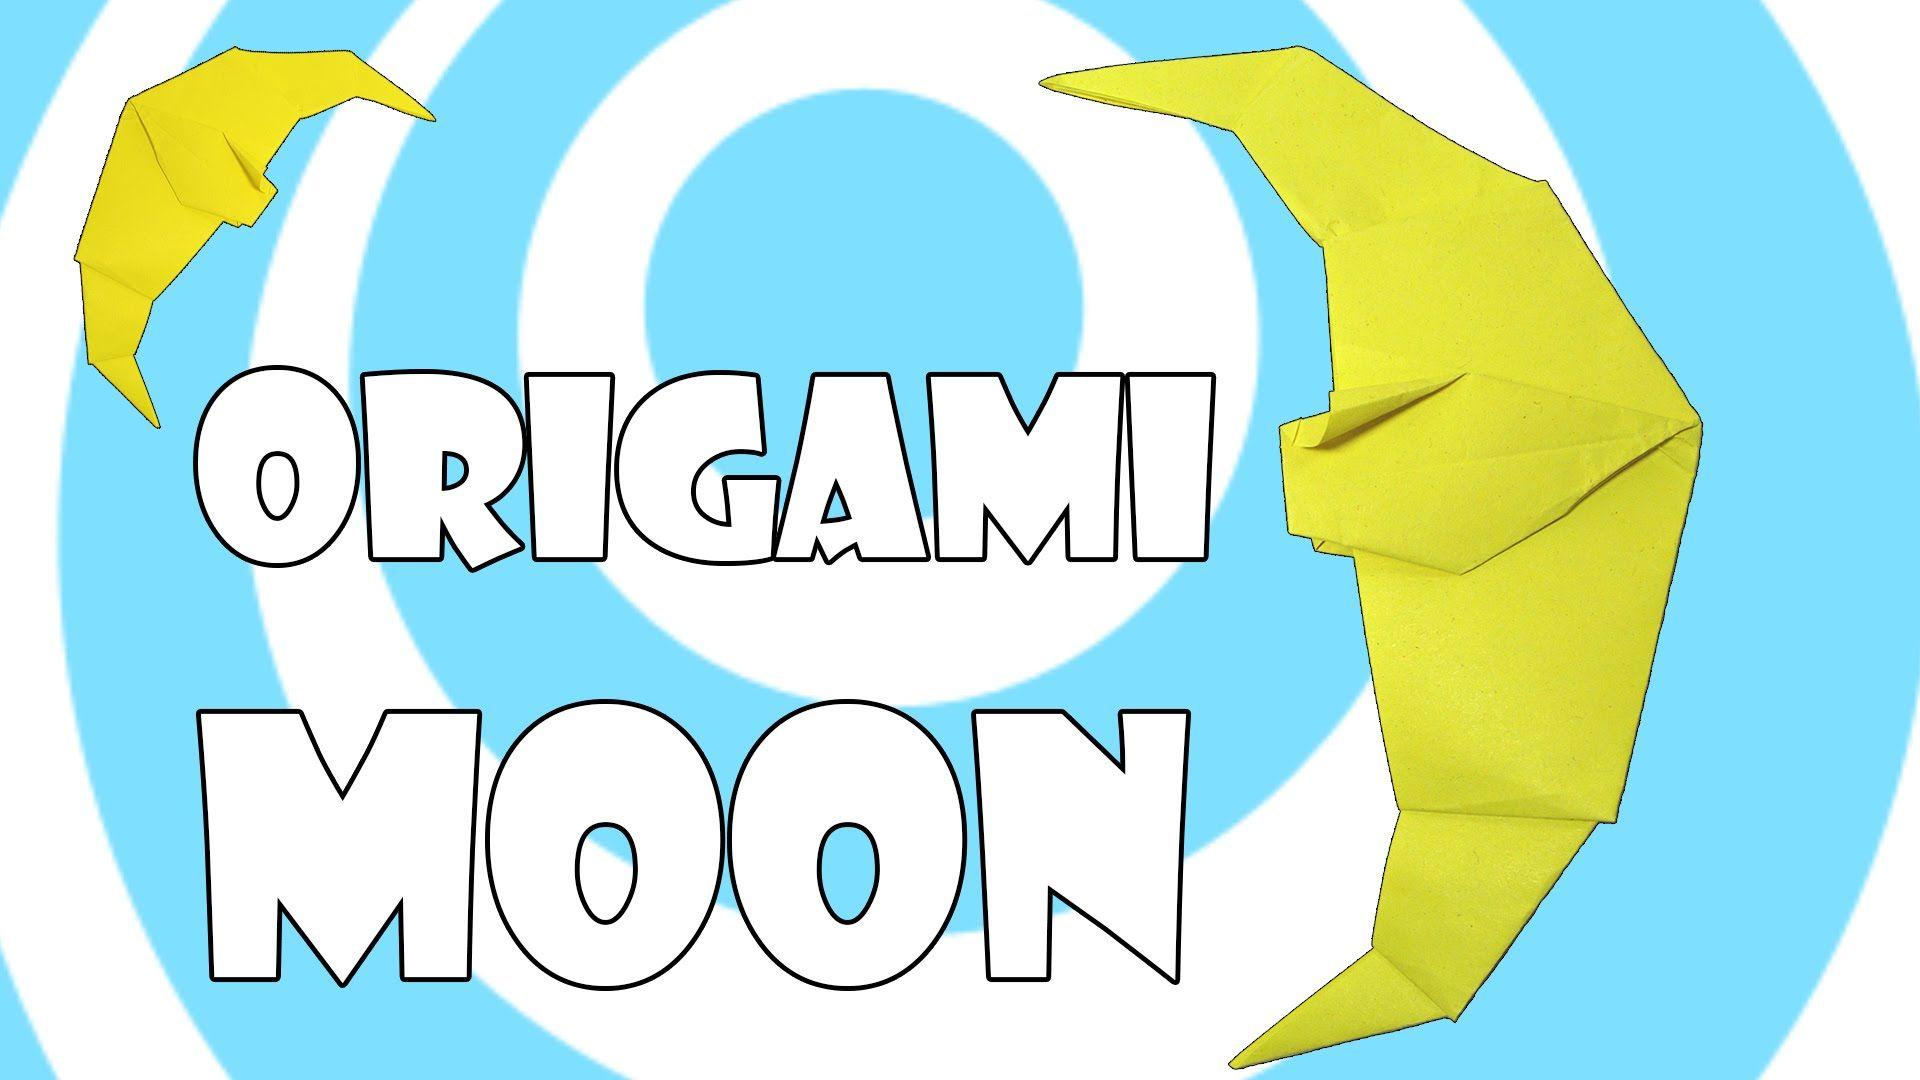 Diy simple origami moon tutorial origami origami instructions diy simple origami moon tutorial origami jeuxipadfo Image collections